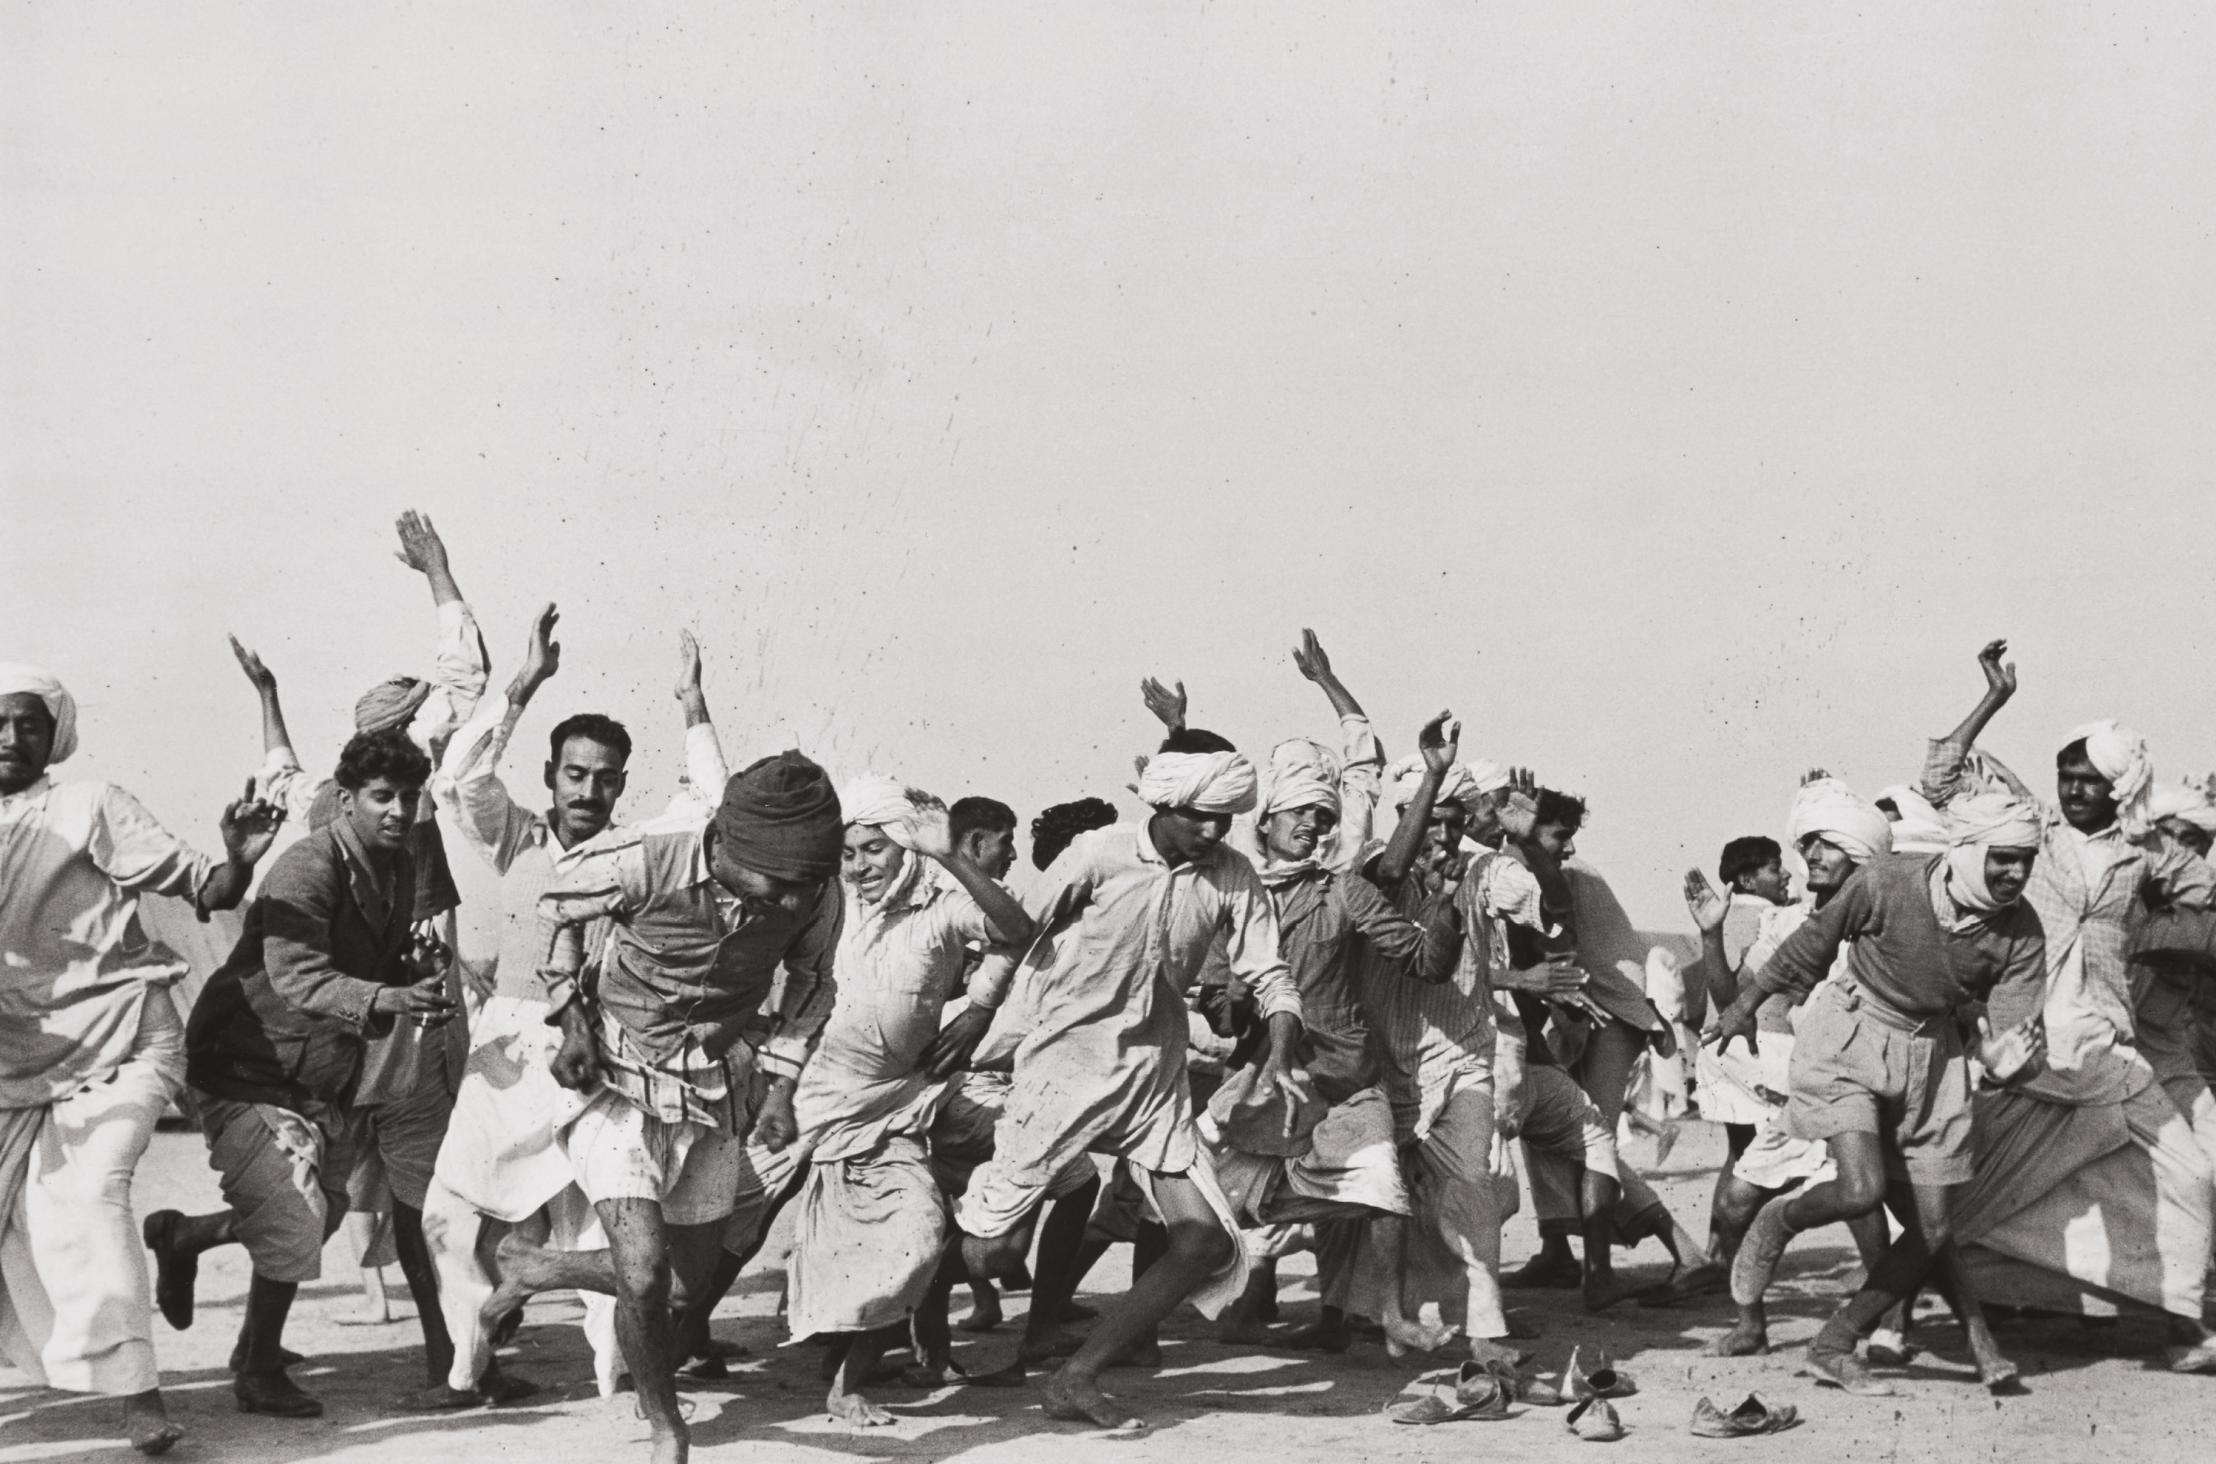 Henri Cartier-Bresson-Games In A Refugee Camp At Kurukshetra, Punjab, India-1947